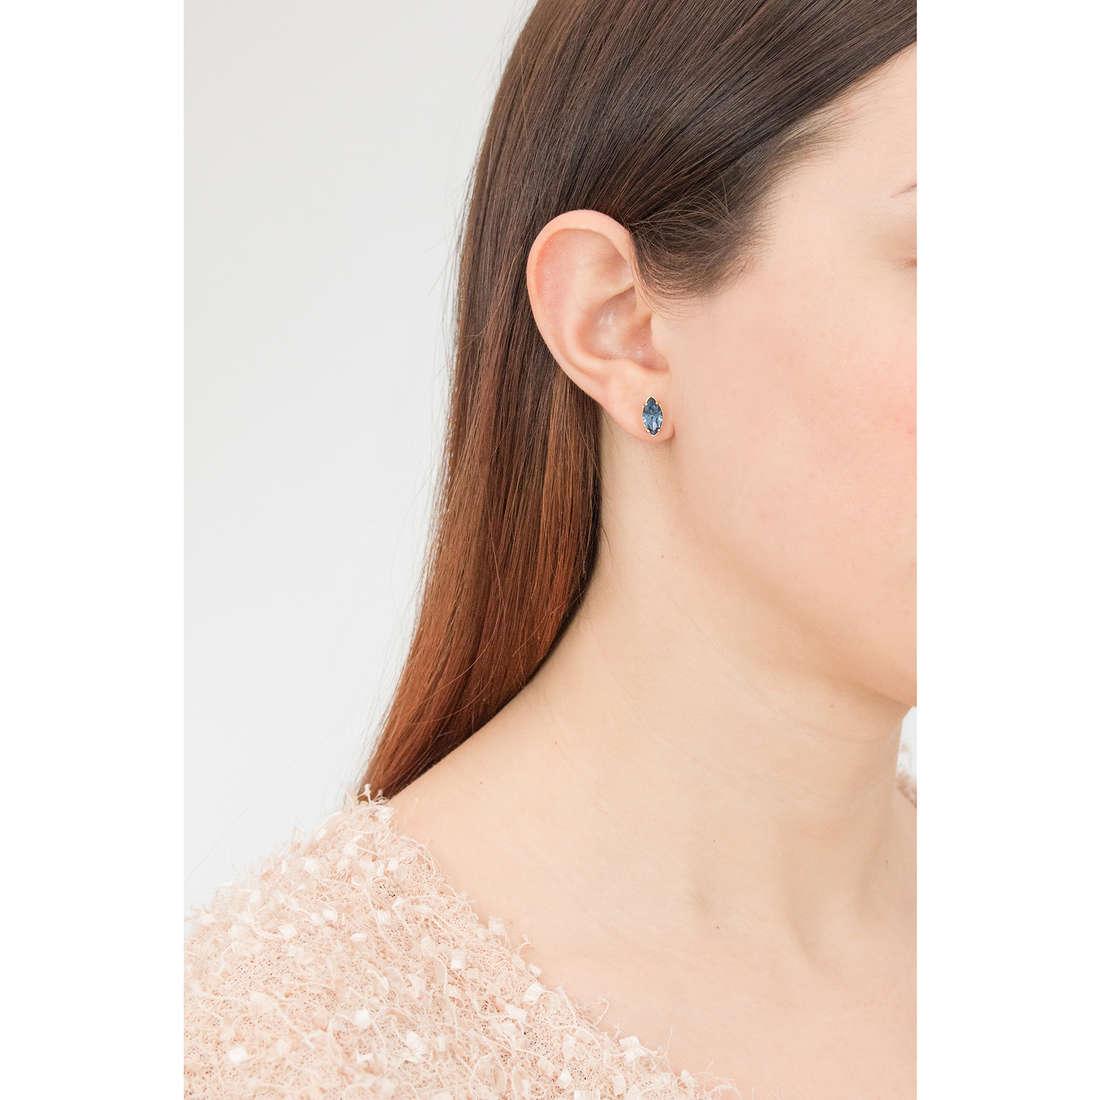 Brosway orecchini Affinity donna BFF48 indosso